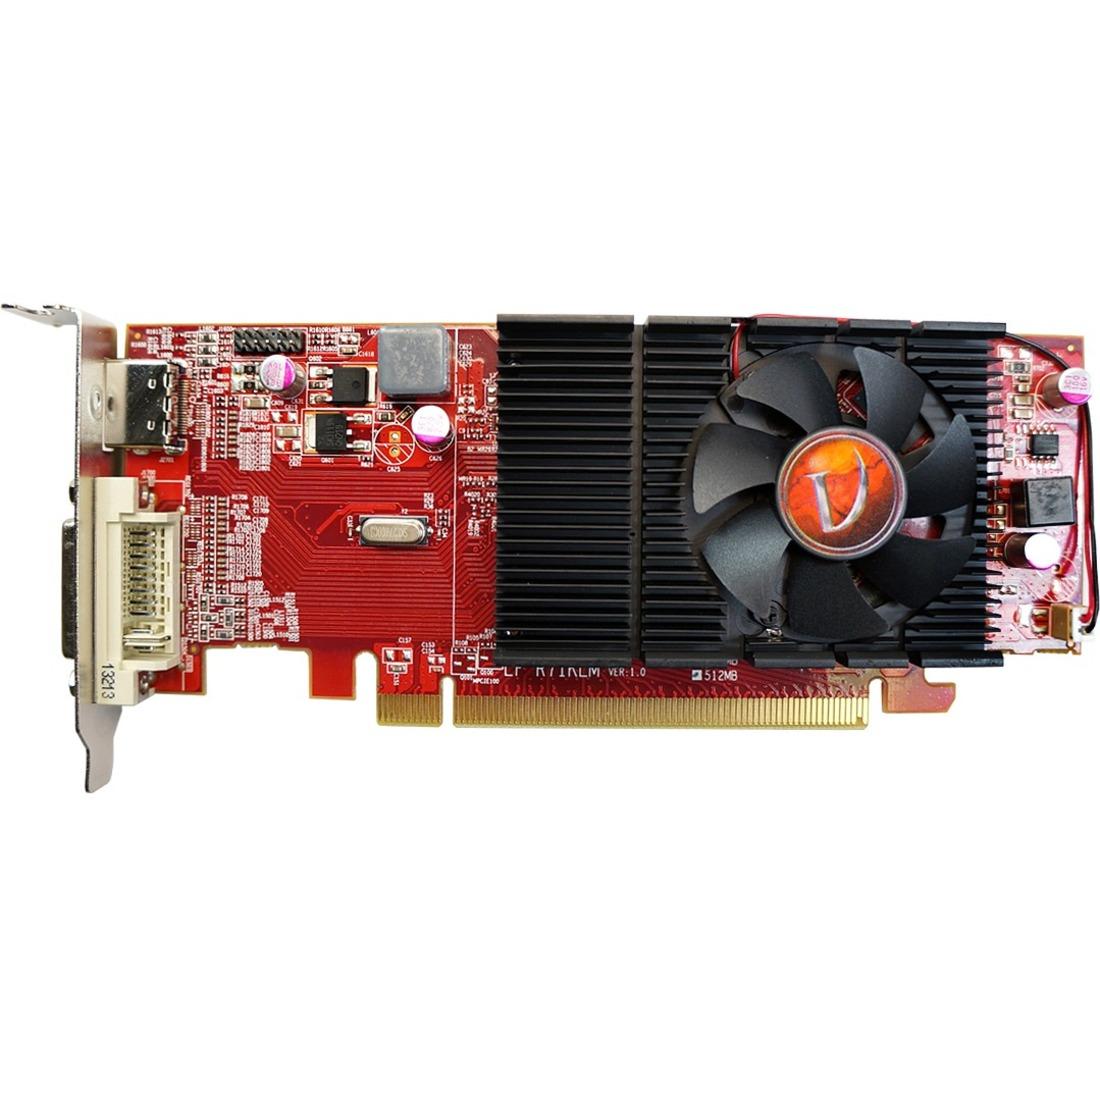 Visiontek Radeon HD 4350 Graphics Card - ATi Radeon HD 4350 - 512MB DDR2  SDRAM 64bit - PCI Express 2 0 900289